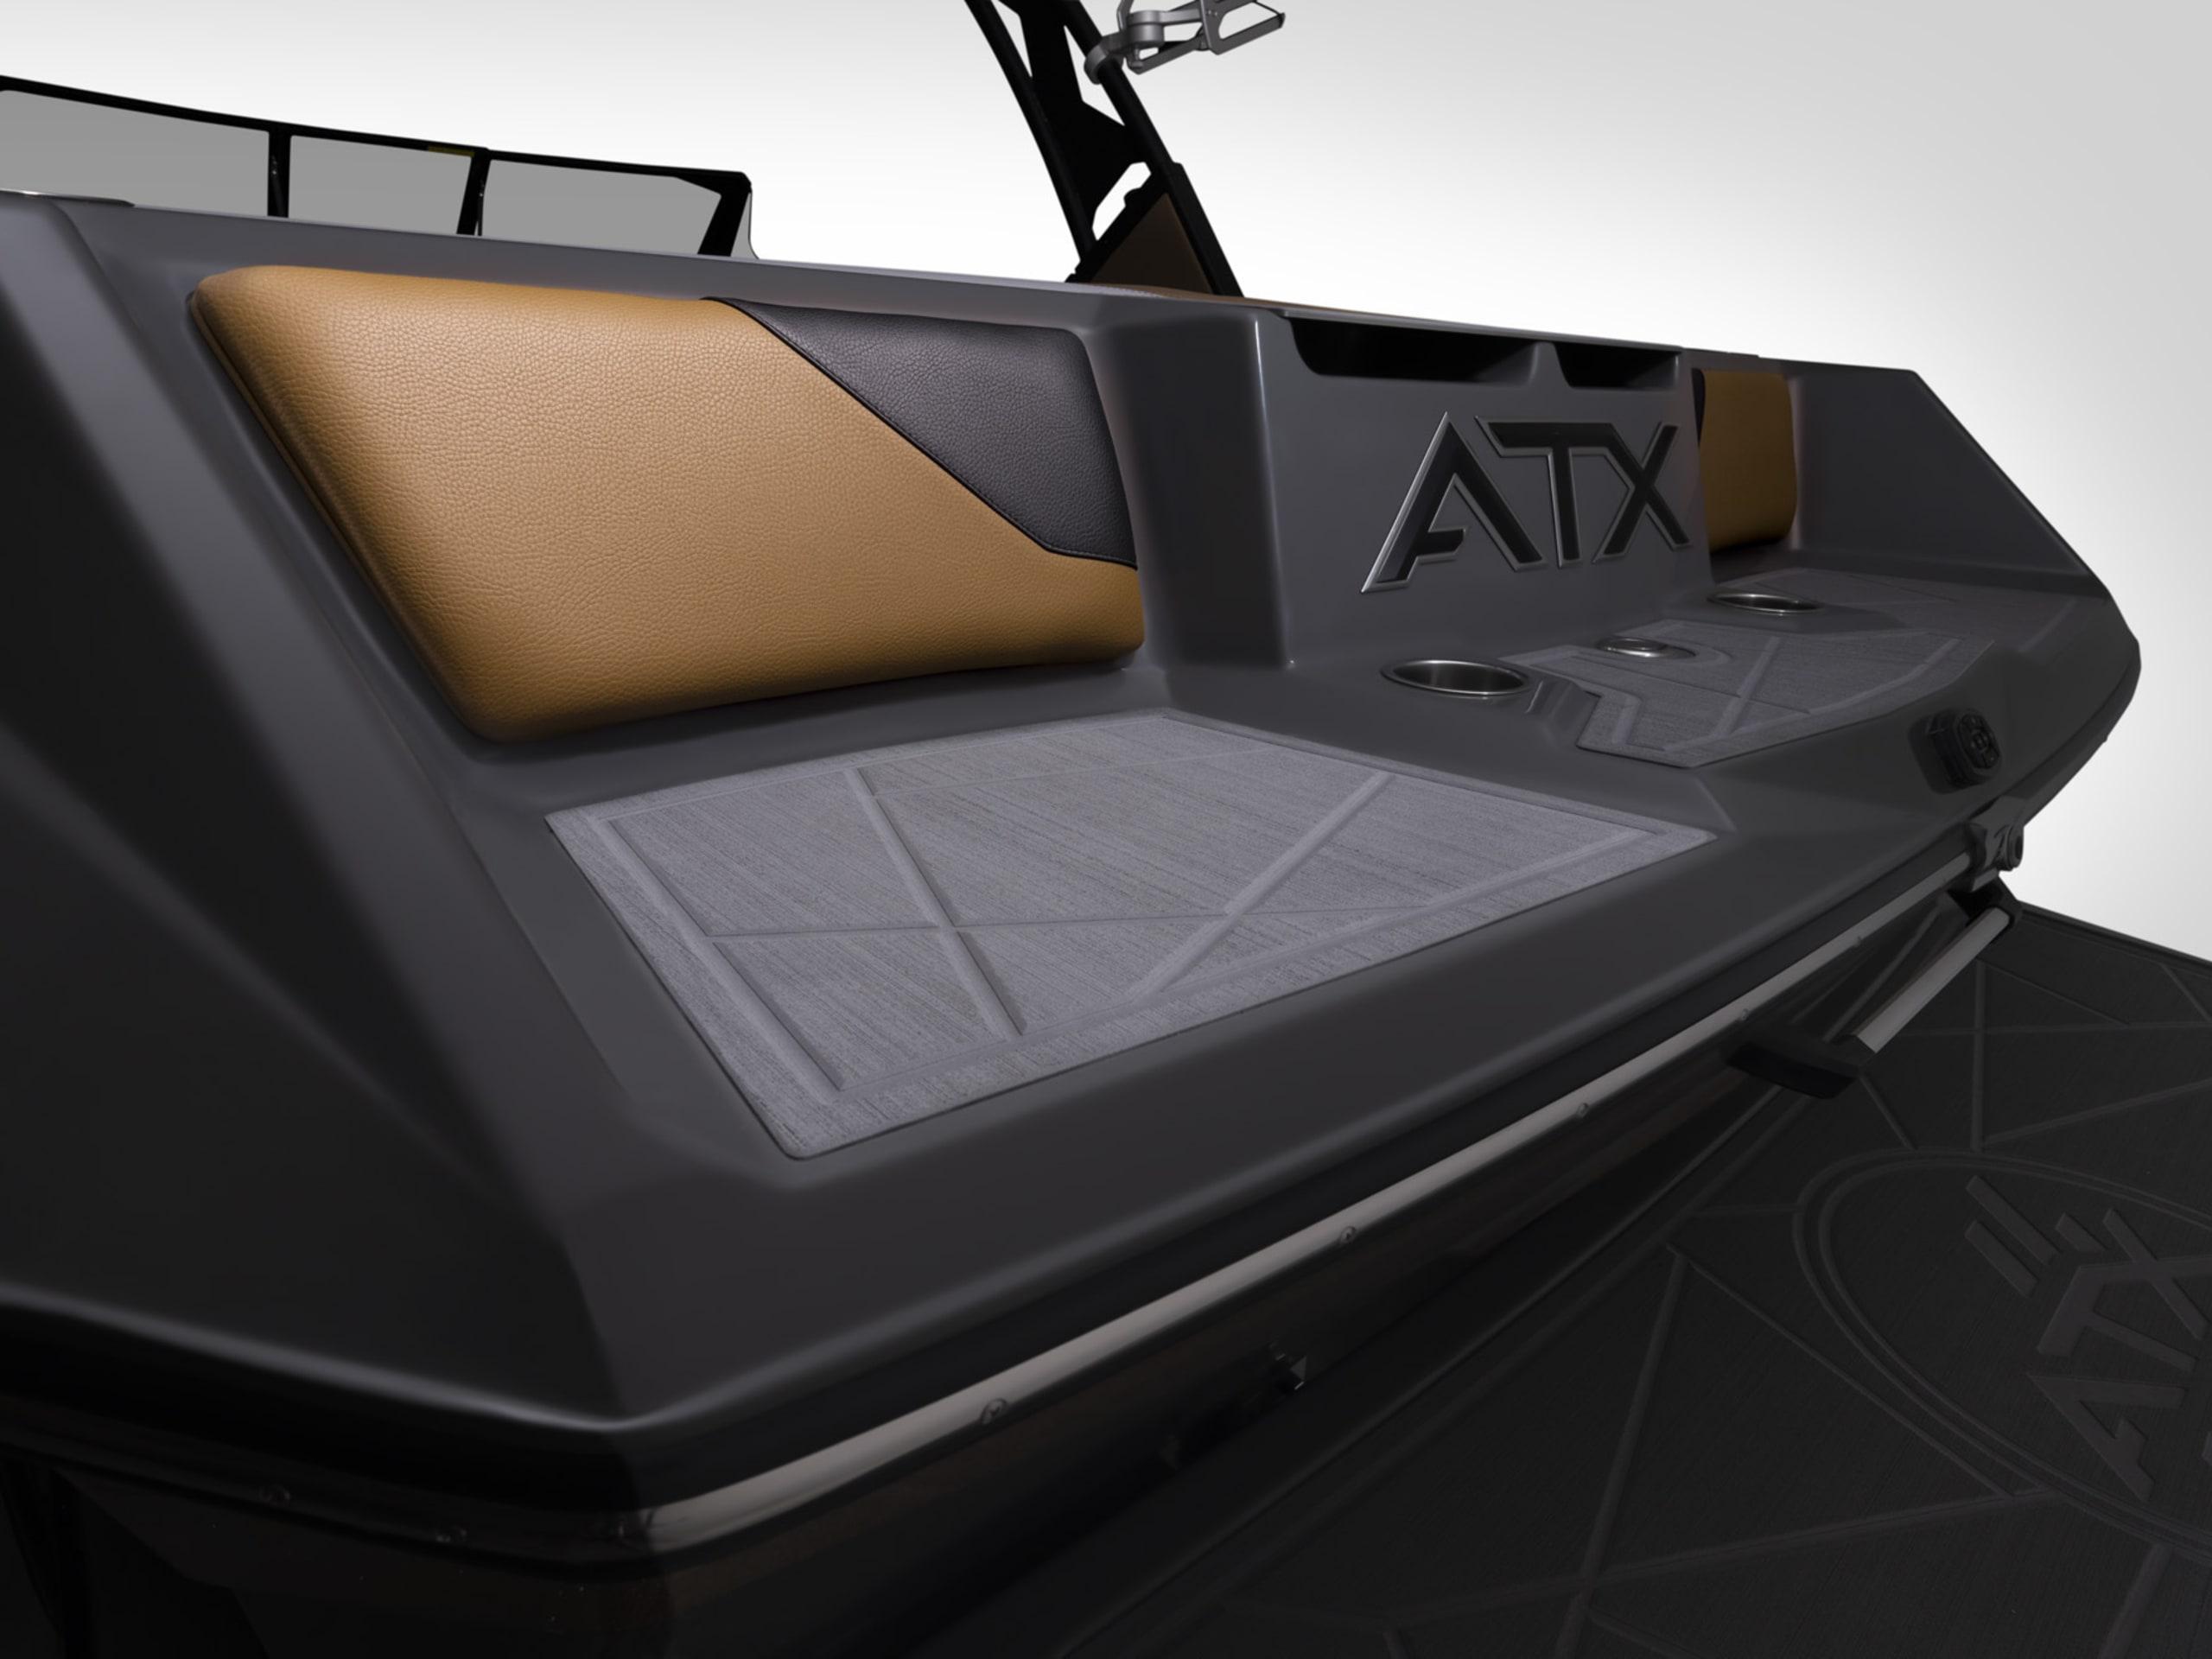 2021 ATX 22 Type S ATX Surf Boats Bradlee Rutledge 0286